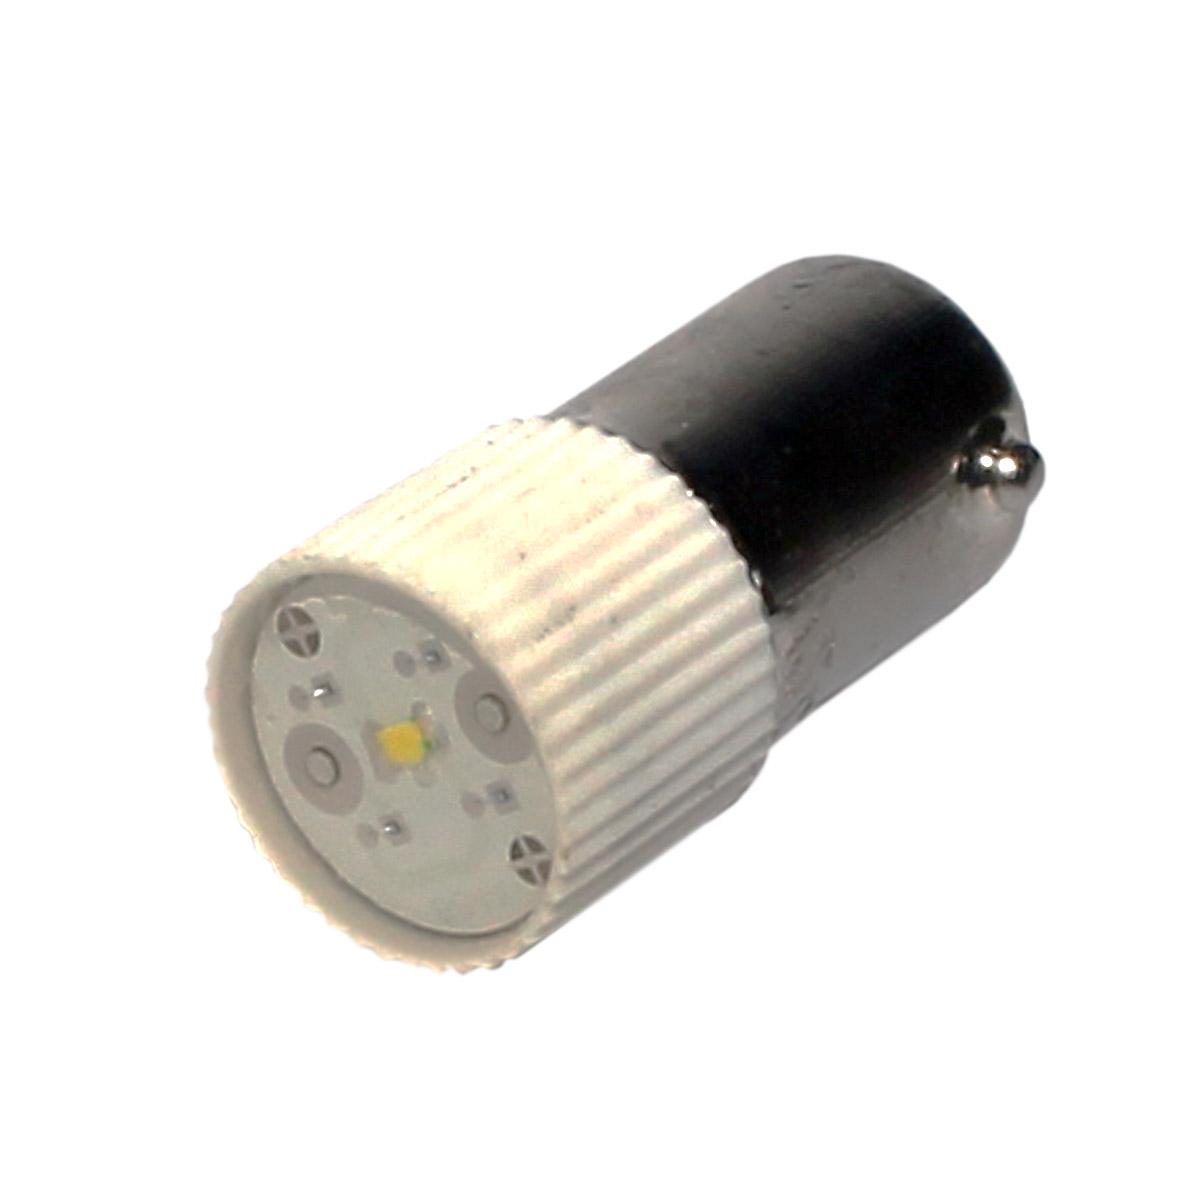 l mpada led 220v ba9s branca eletrope as comercial